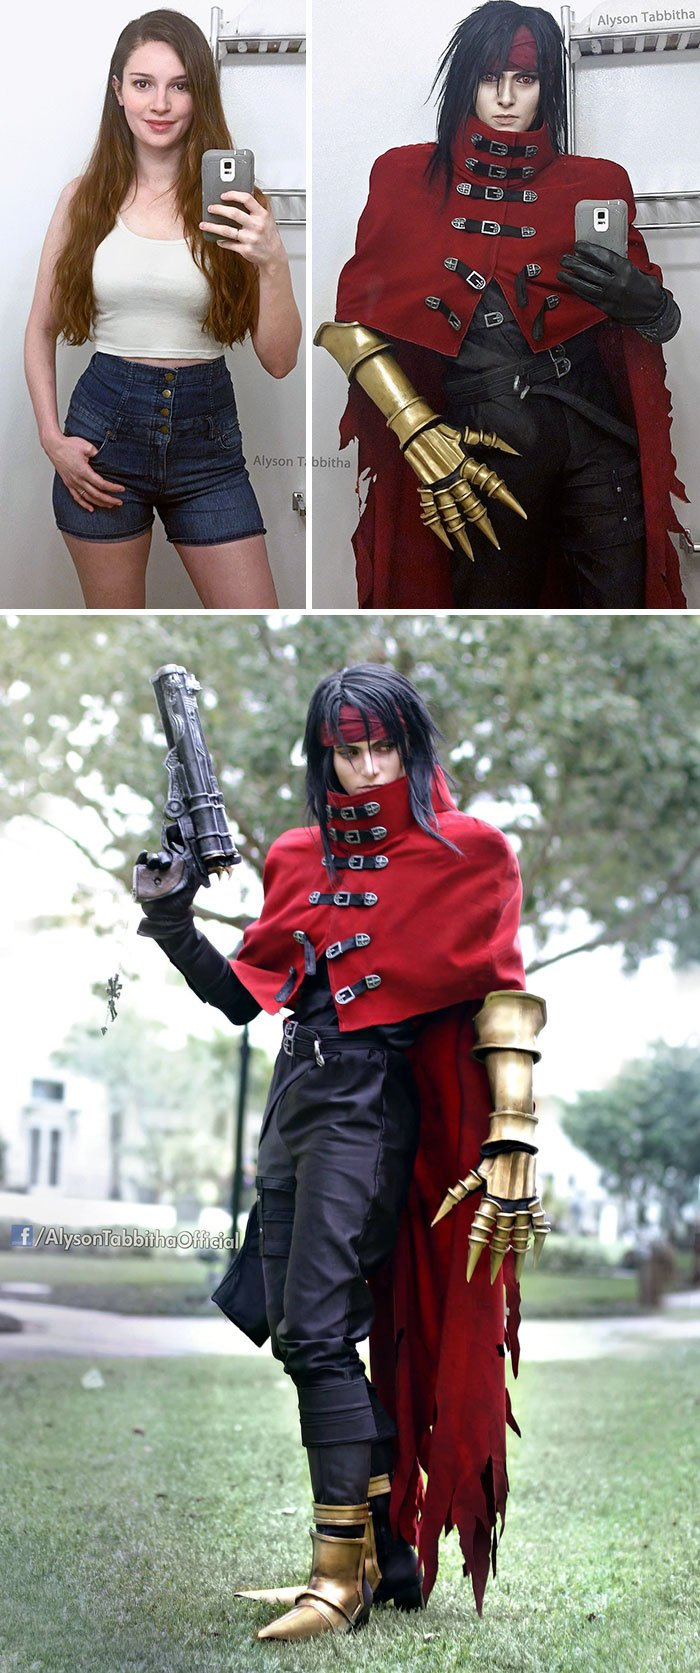 video-game-anime-cosplay-alyson-tabbitha-10-5953aaf8bf482__700